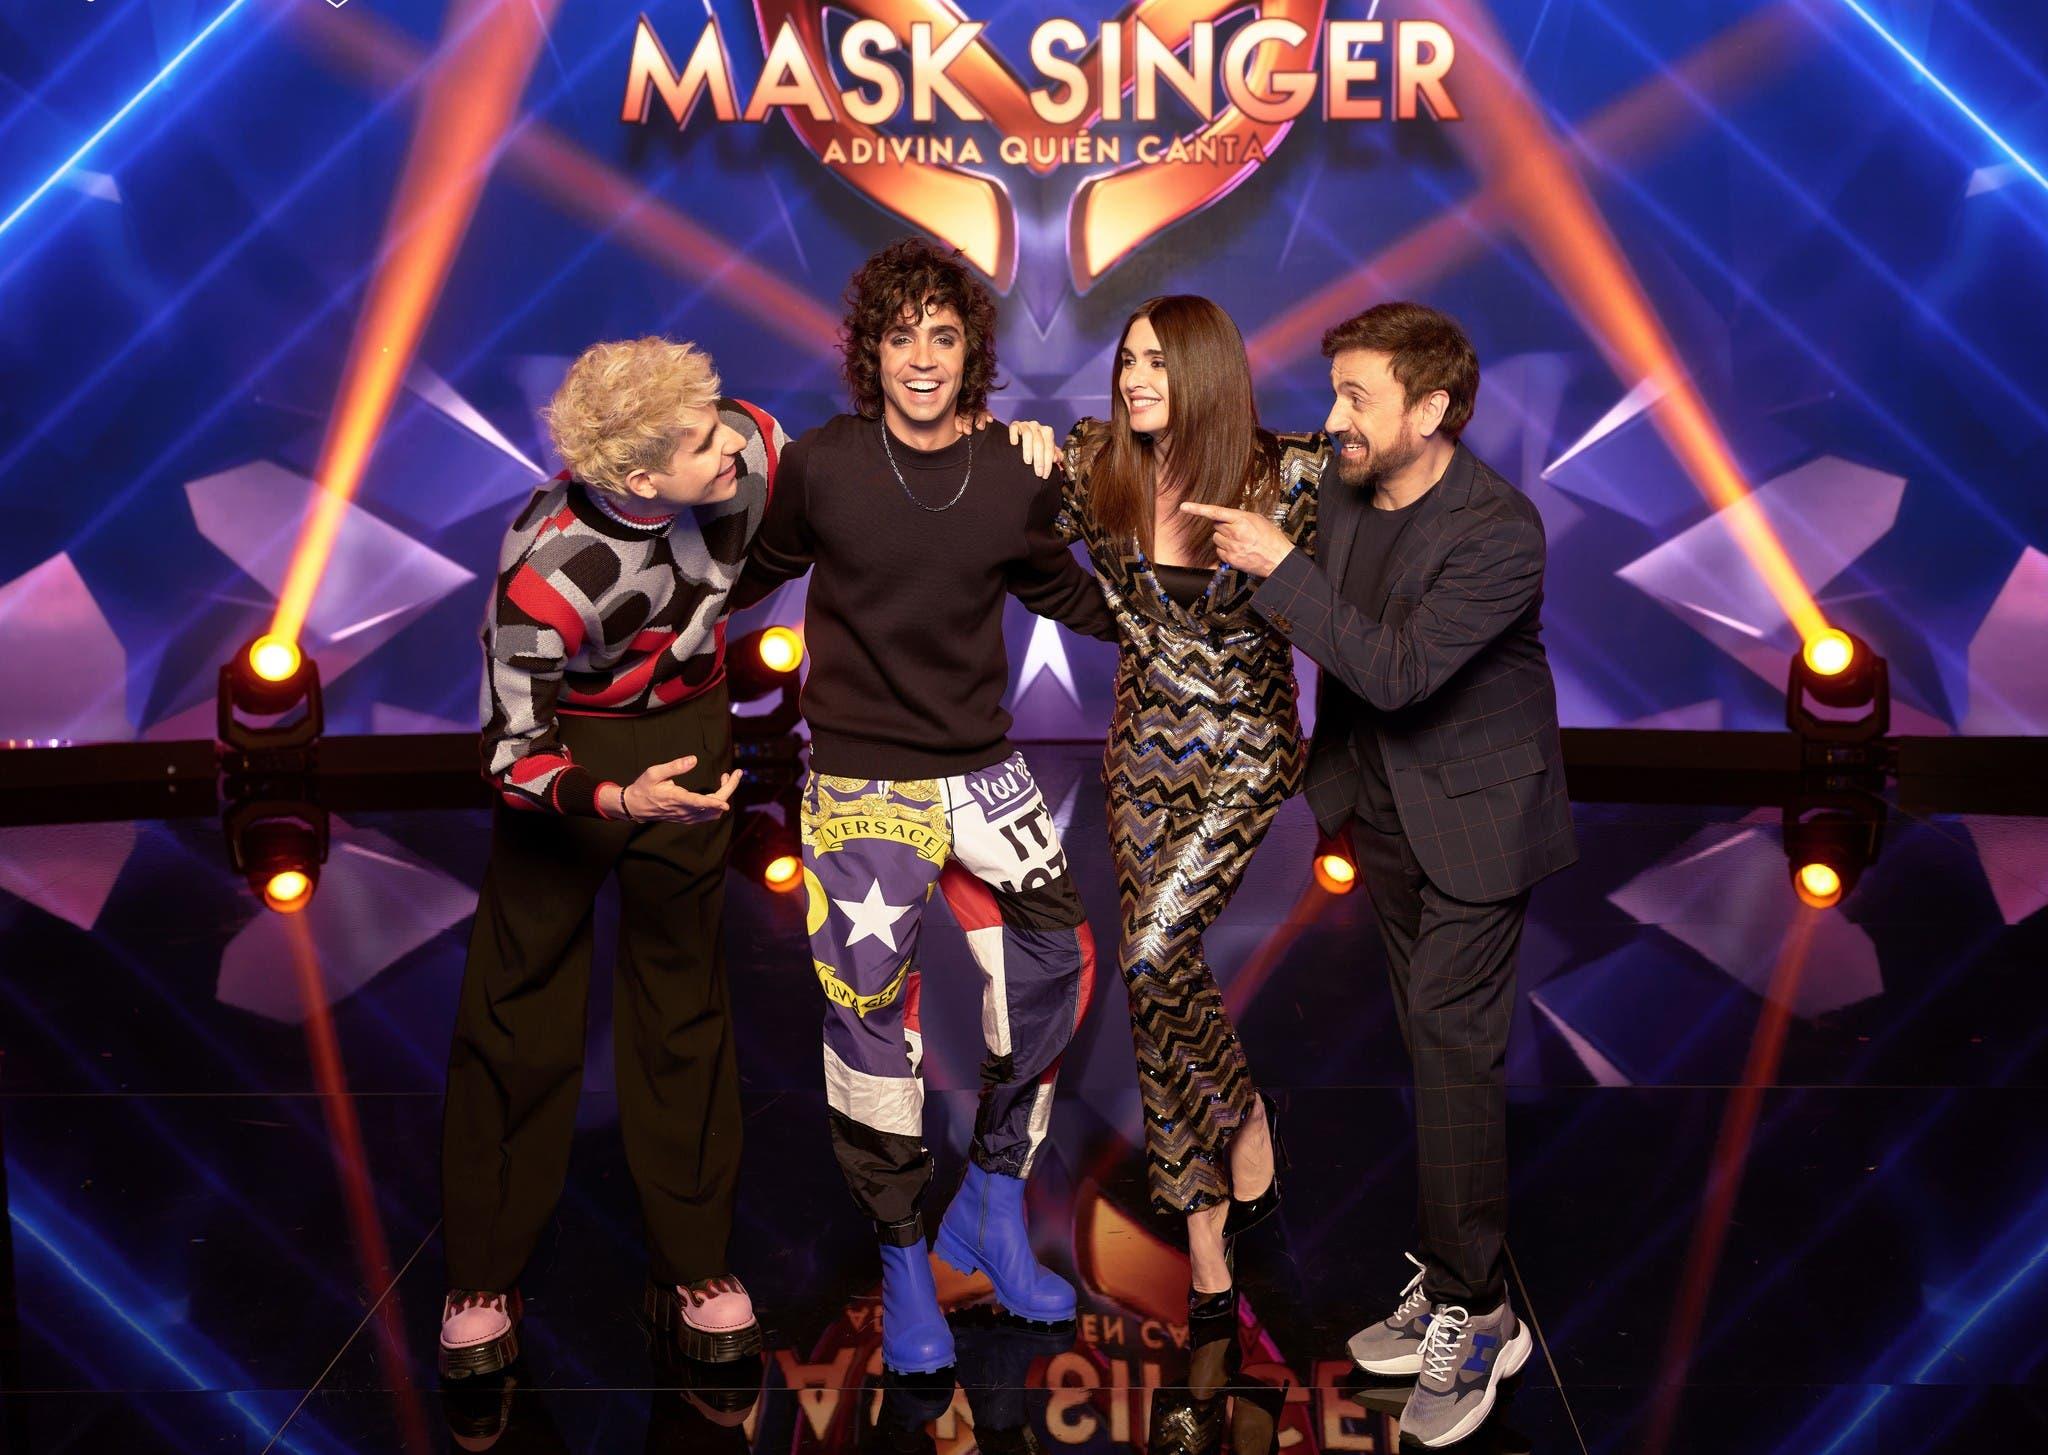 Mask Singer estreno